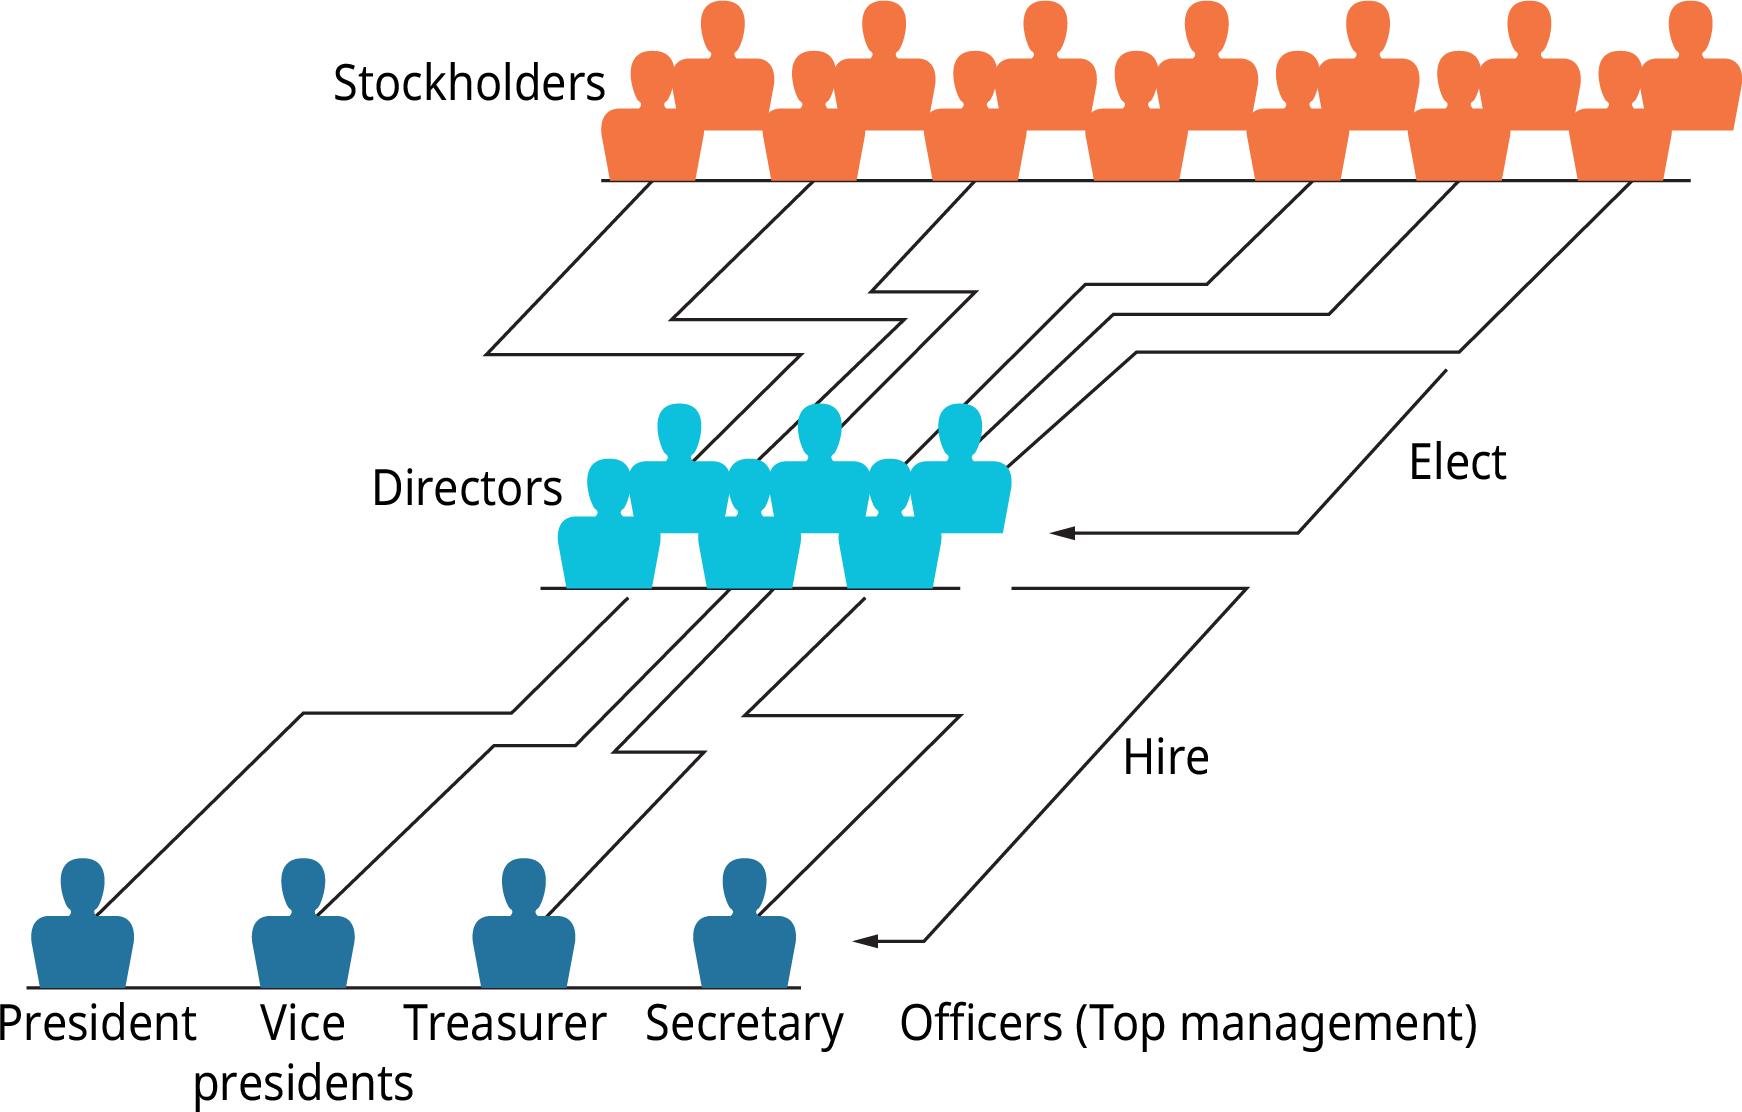 Anexa 4.2 Structura organizatorică a corporațiilor Atribuire: Copyright Rice University, OpenStax, sub licența CC BY-NC-SA 4.0